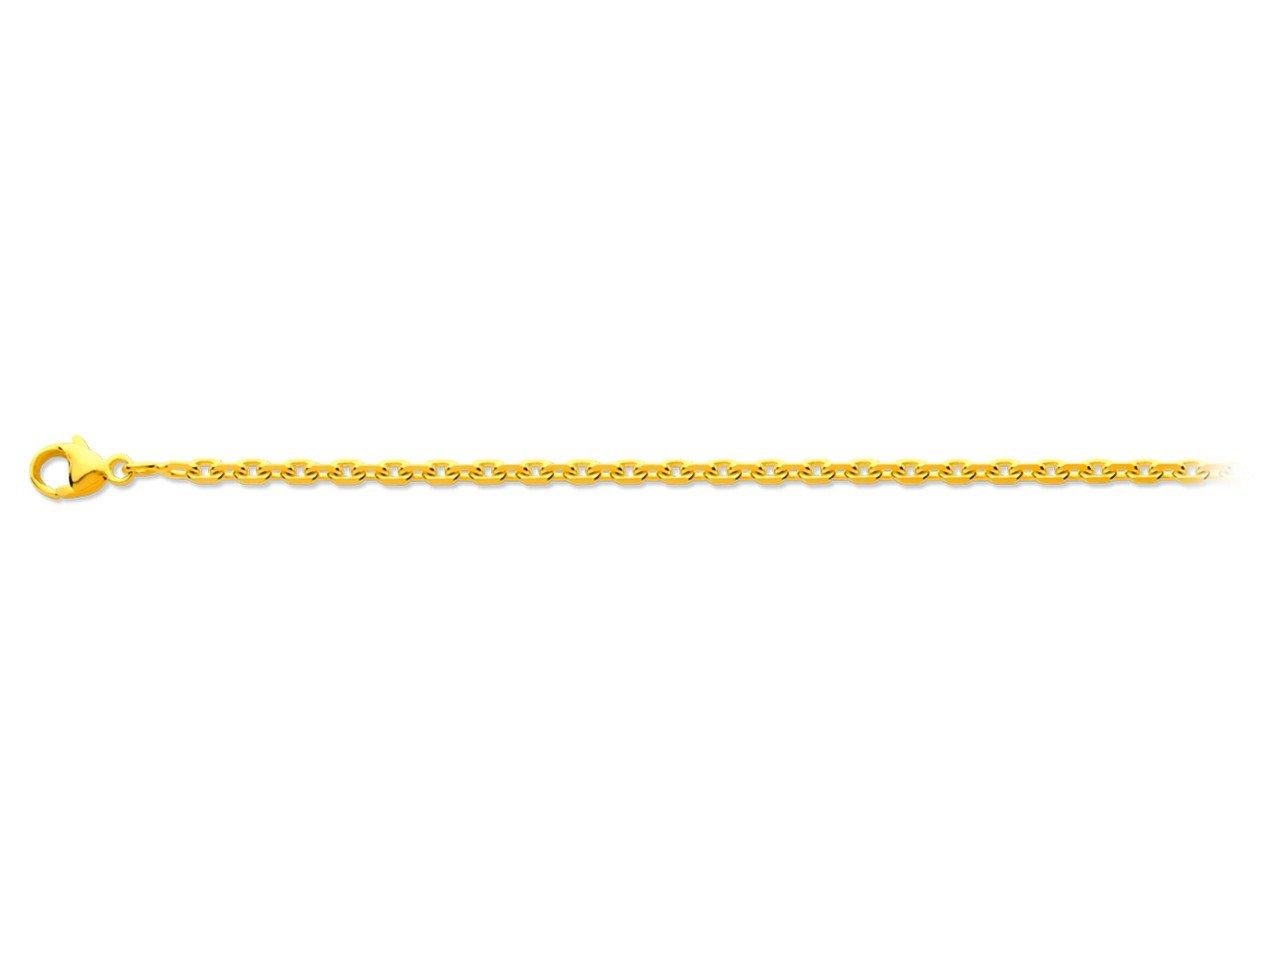 Chaîne maille forçat en or jaune - 55 cm